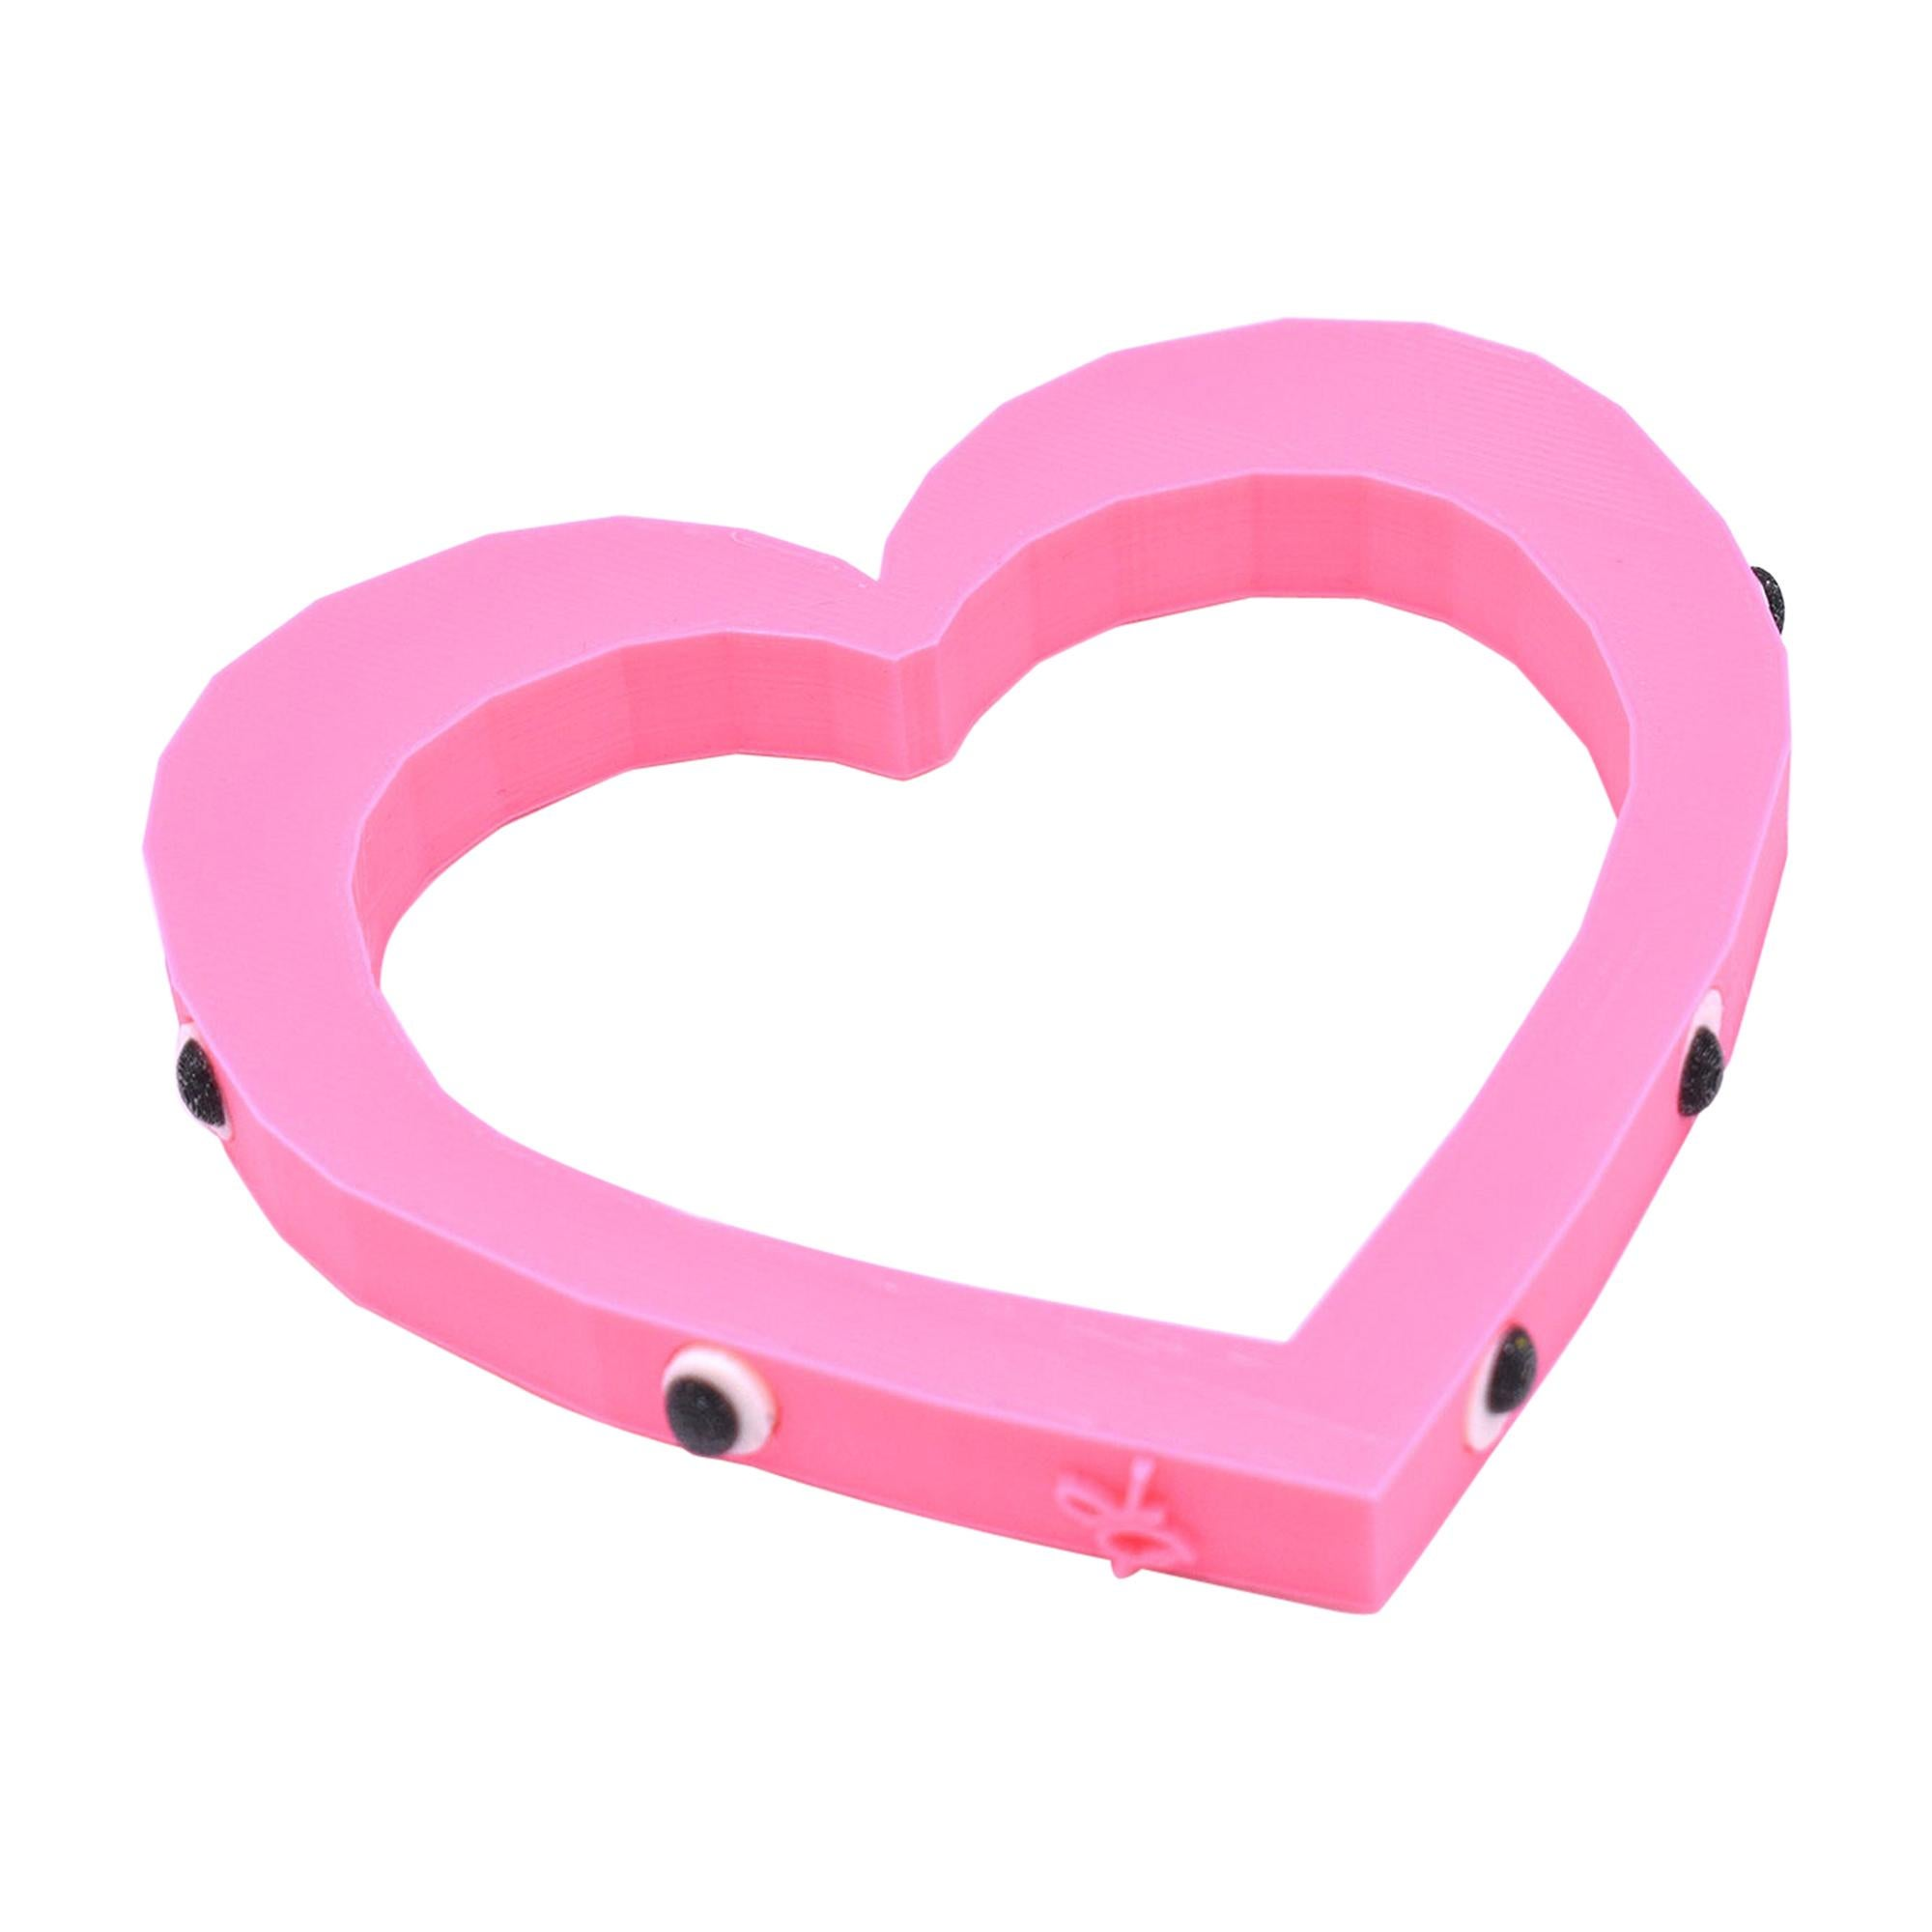 3d Printed Foolish Heart Bangle Pink